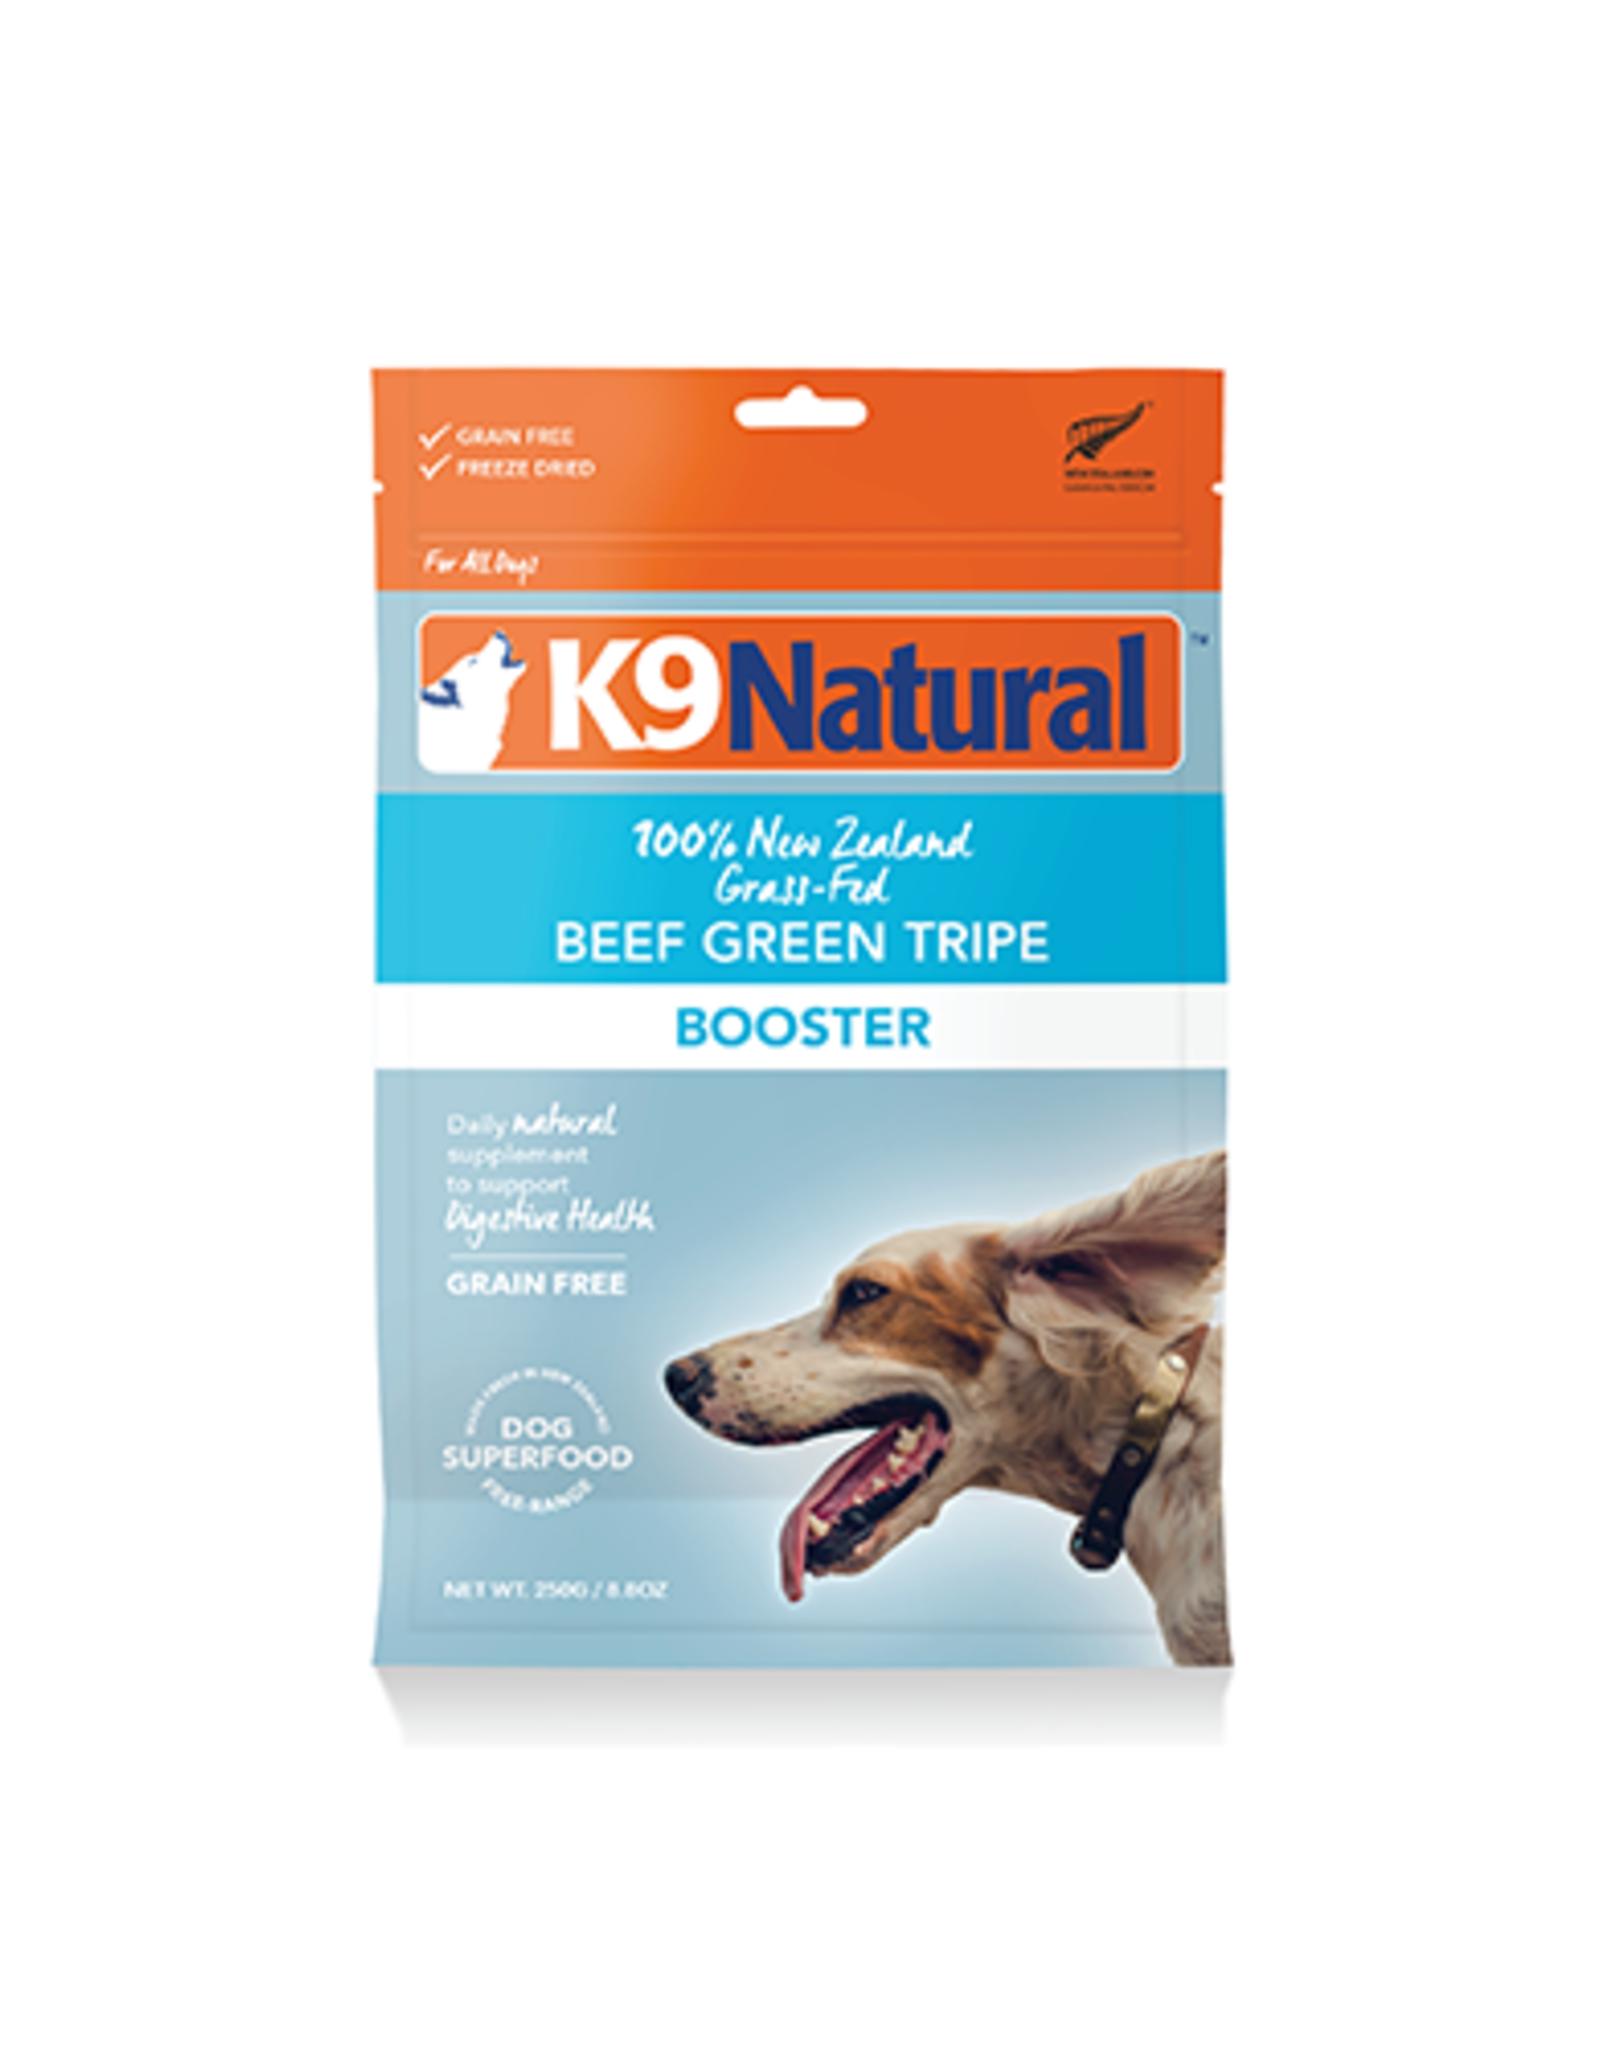 k9 Natural k9 natural beef green tripe booster